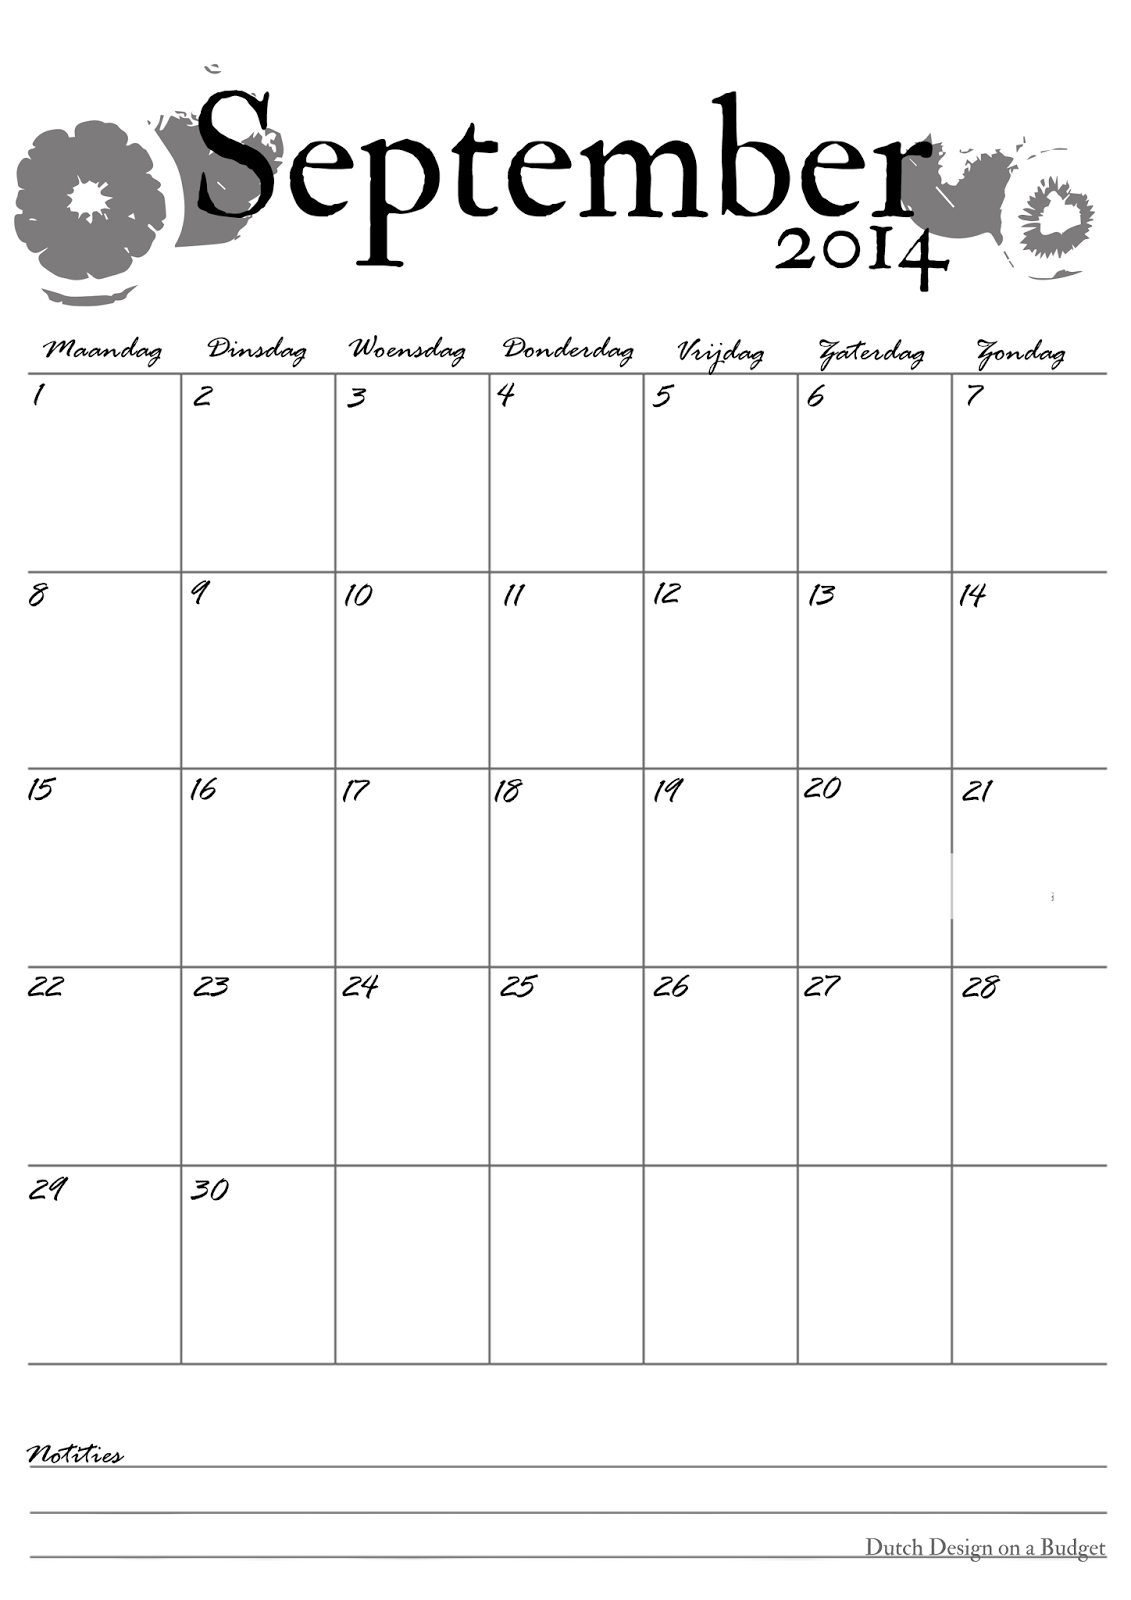 Dutch Design on a Budget: Kalender van September!